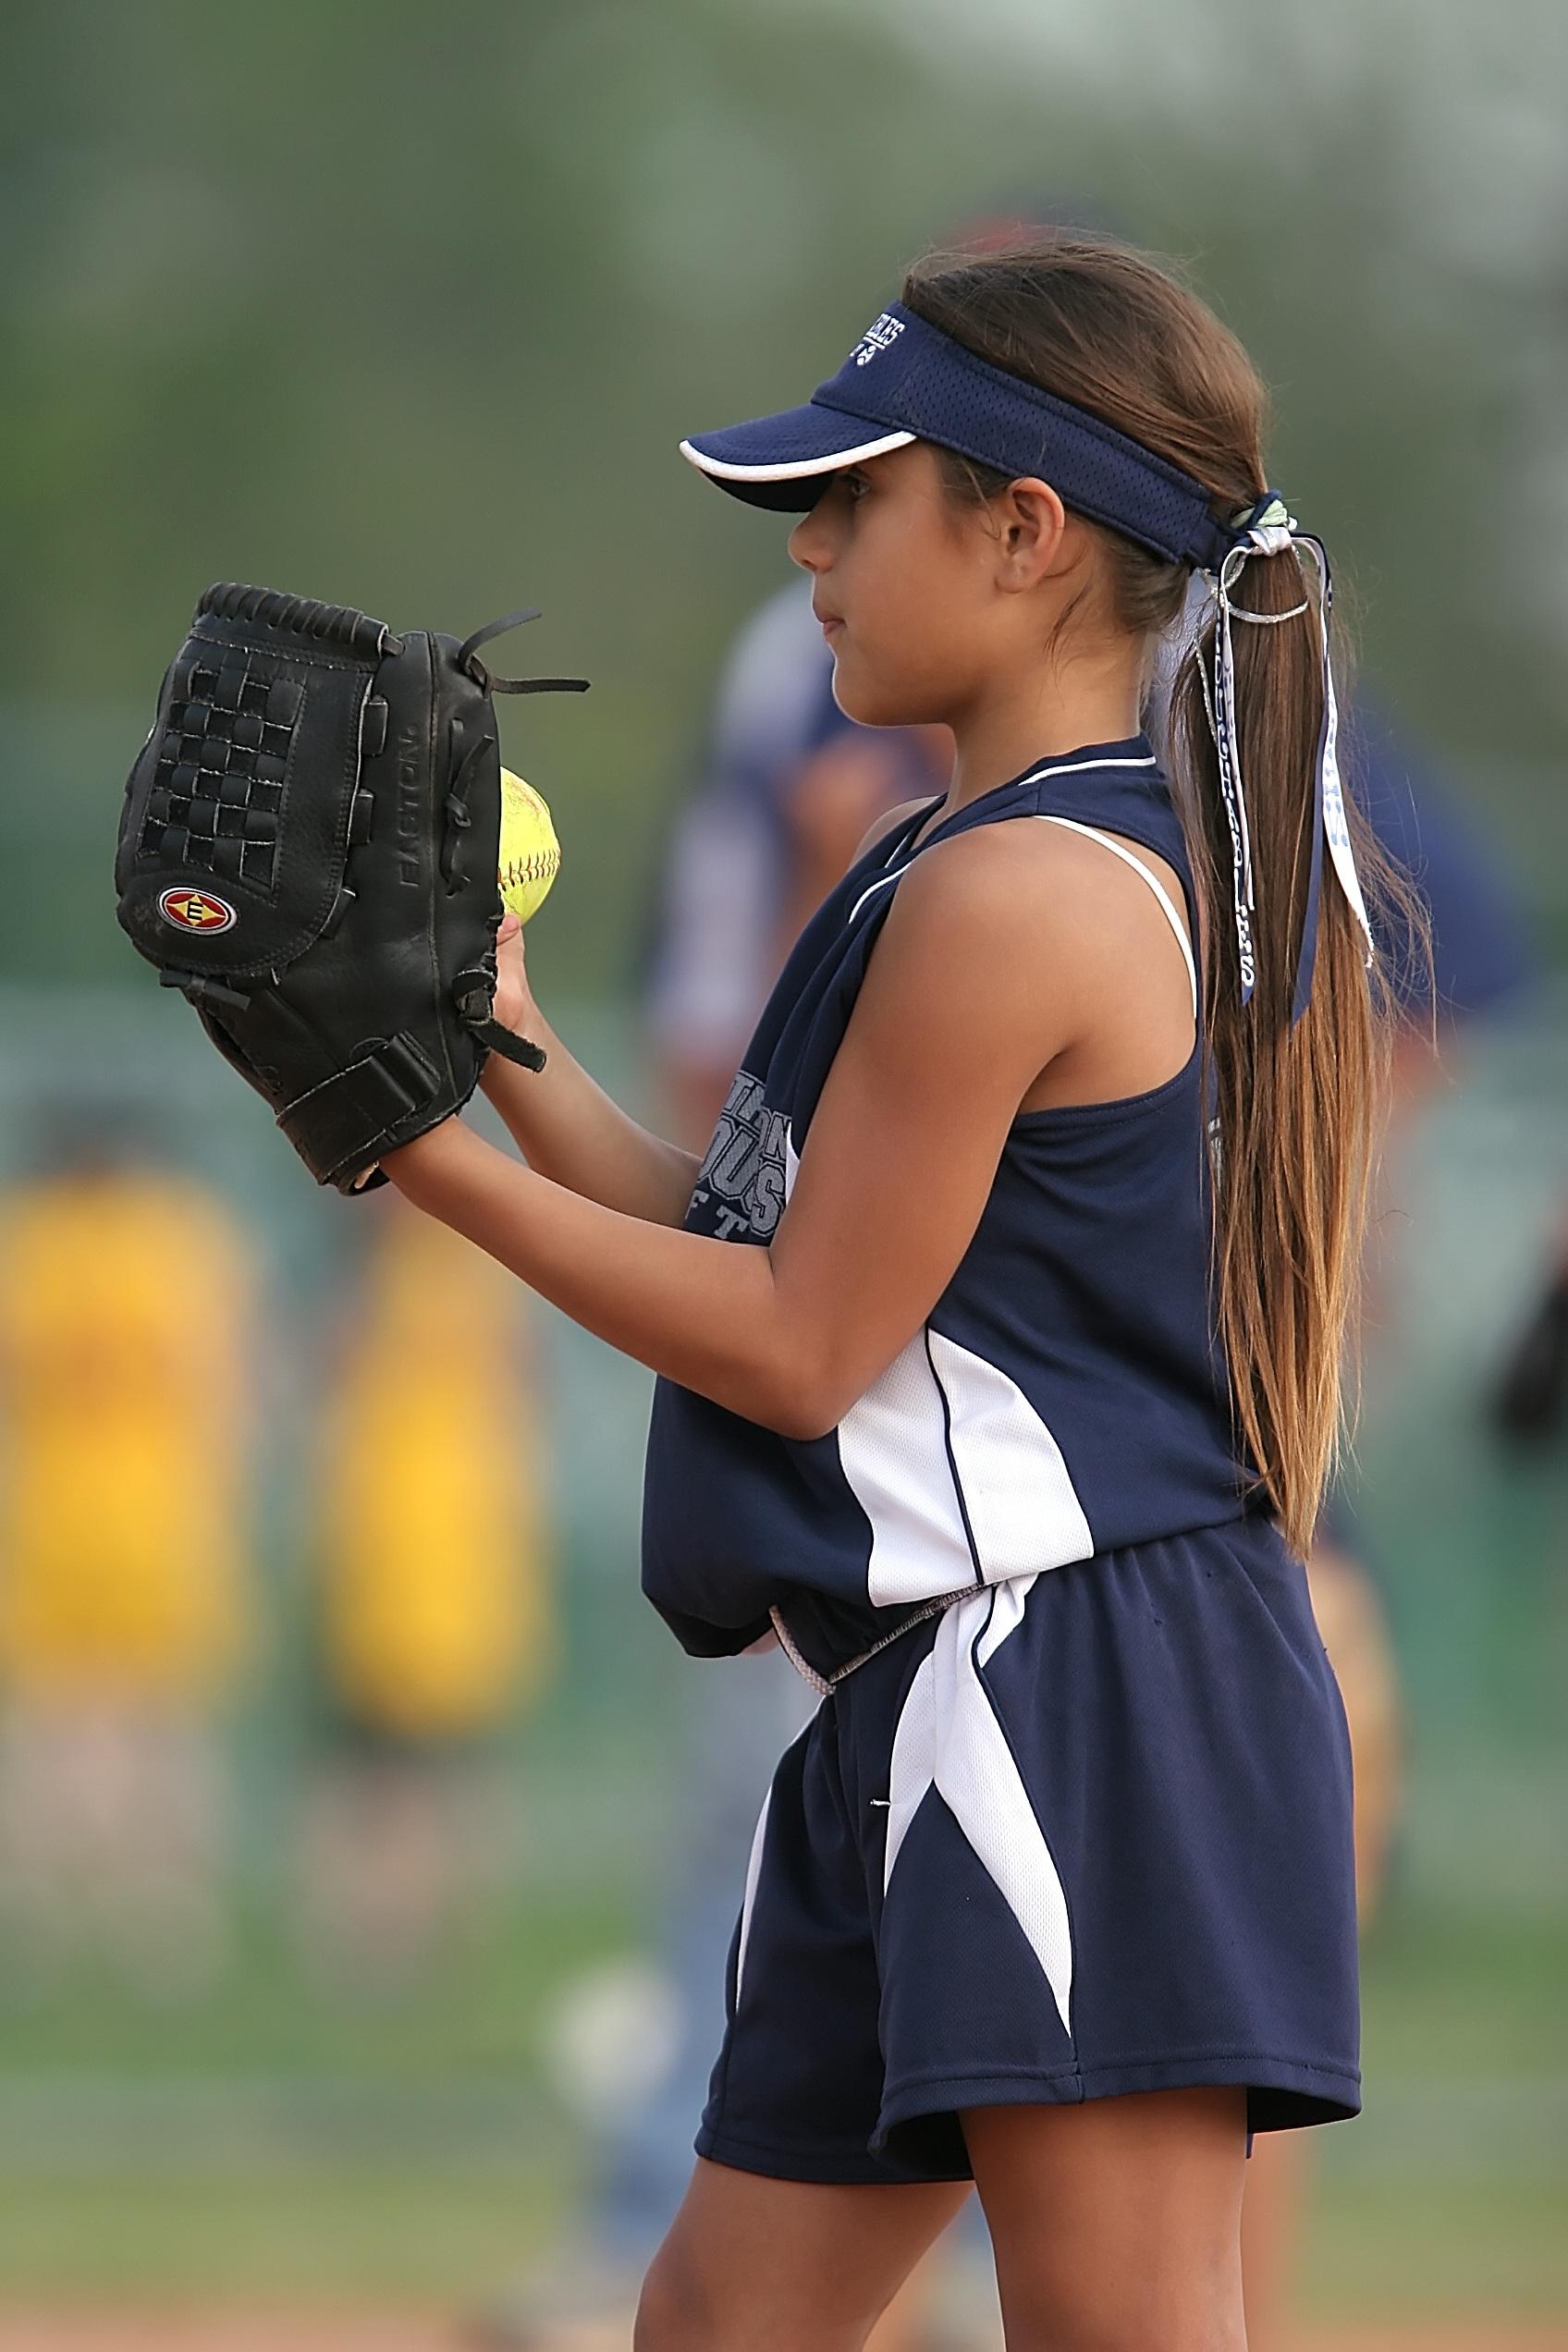 shemale-shaking-teen-girls-wearing-softball-uniforms-teen-blonde